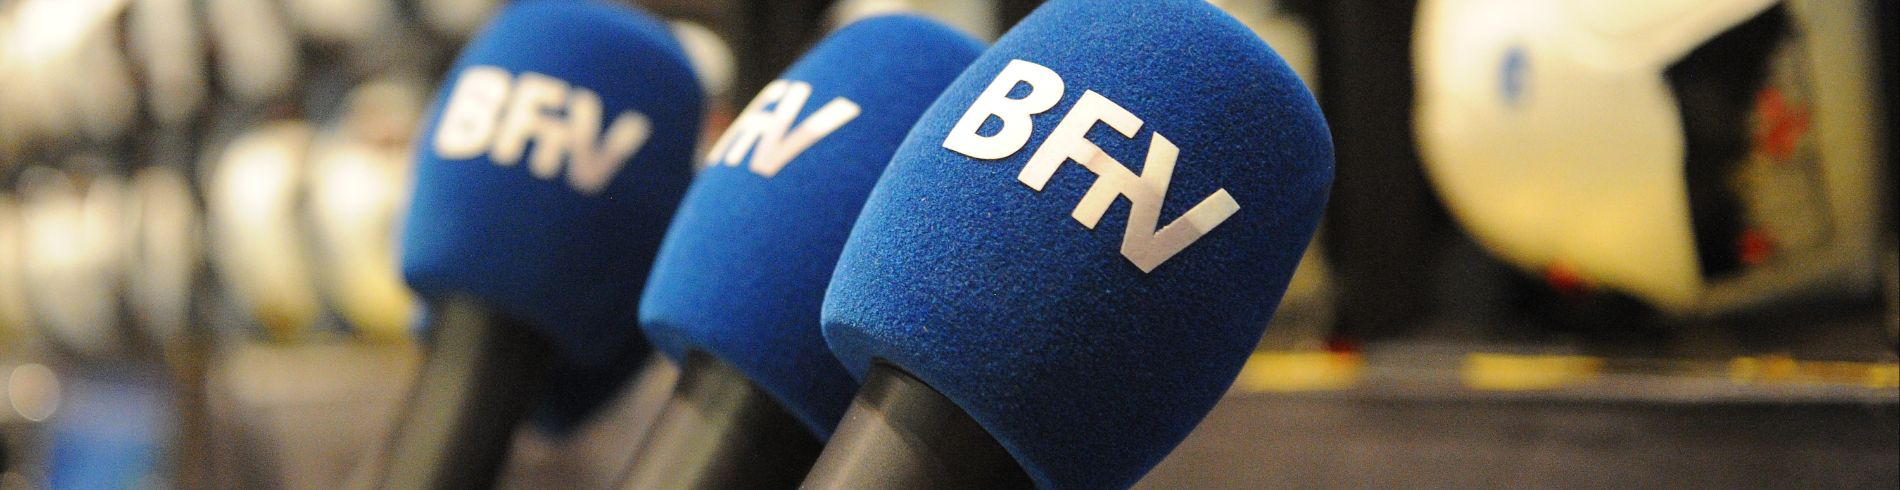 BFV-Presse-Downloads cover image